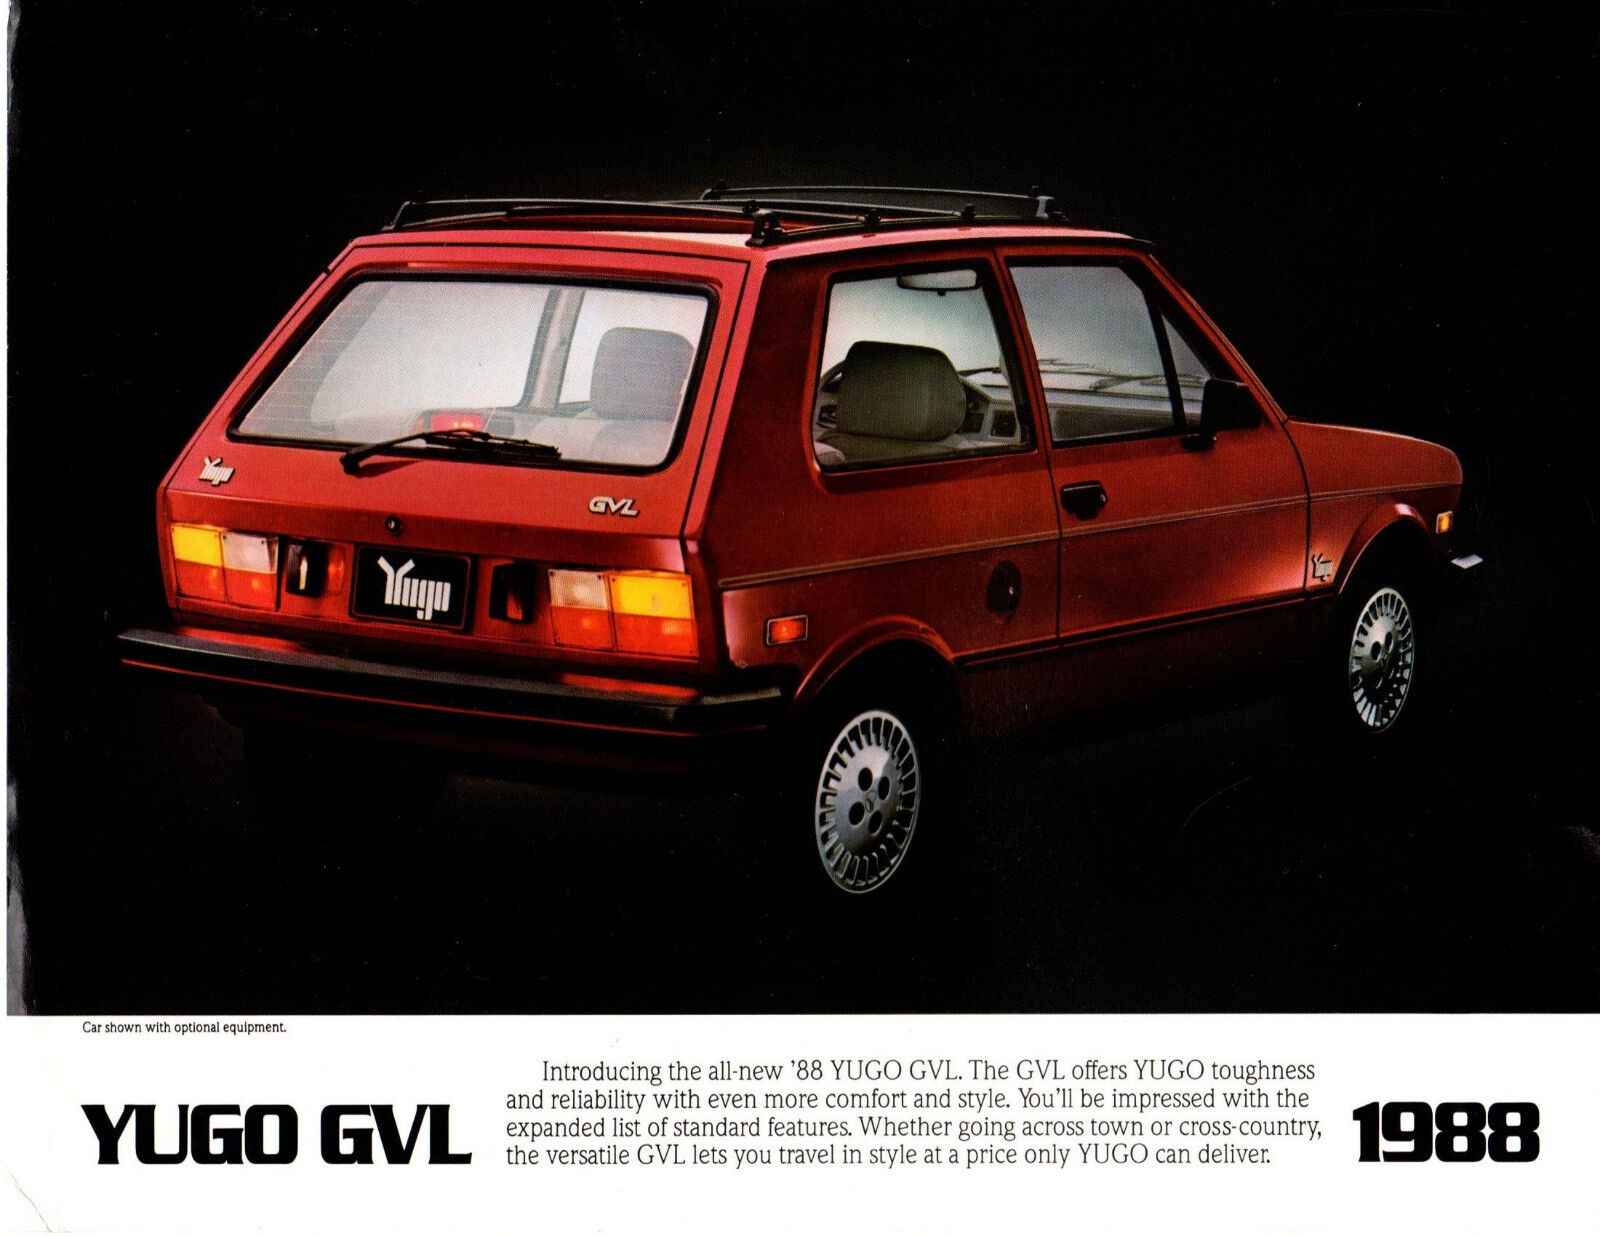 1986 Yugo GV Fiat based 127 Original Car Postcard like 1-page Brochure Card